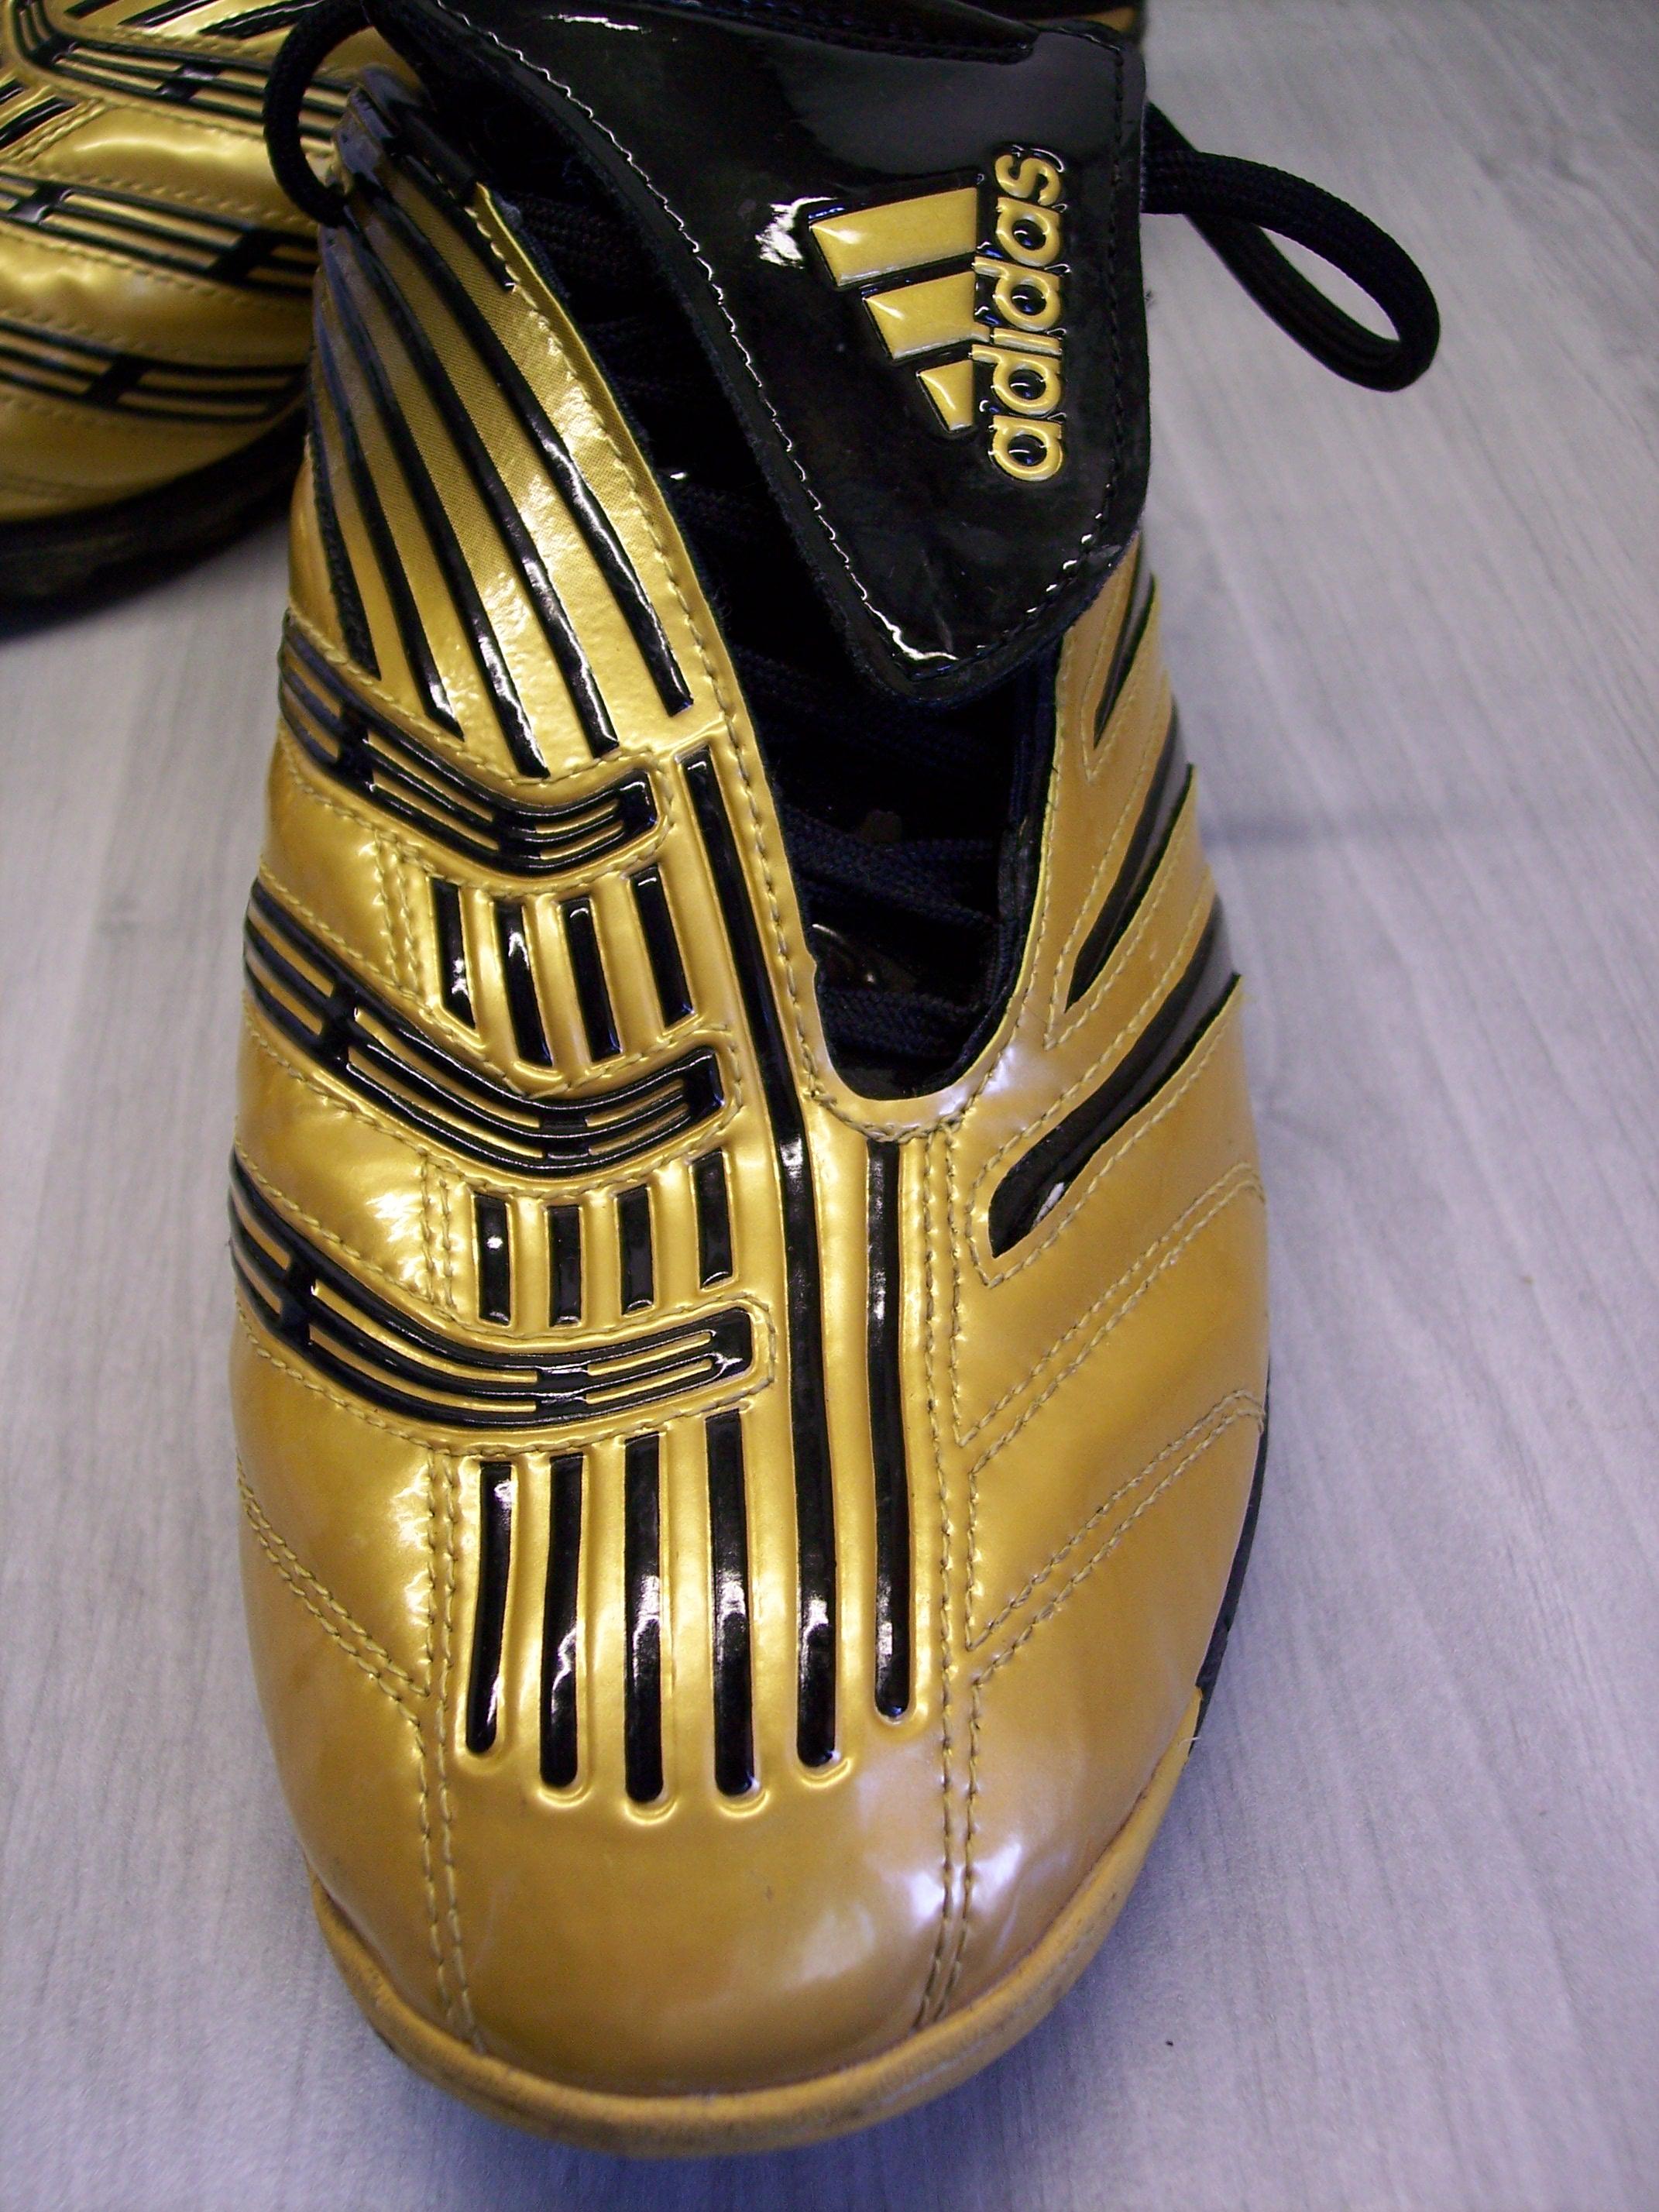 timeless design 3f6fe b8d4d File Adidas Absolado TRX TF-3.JPG